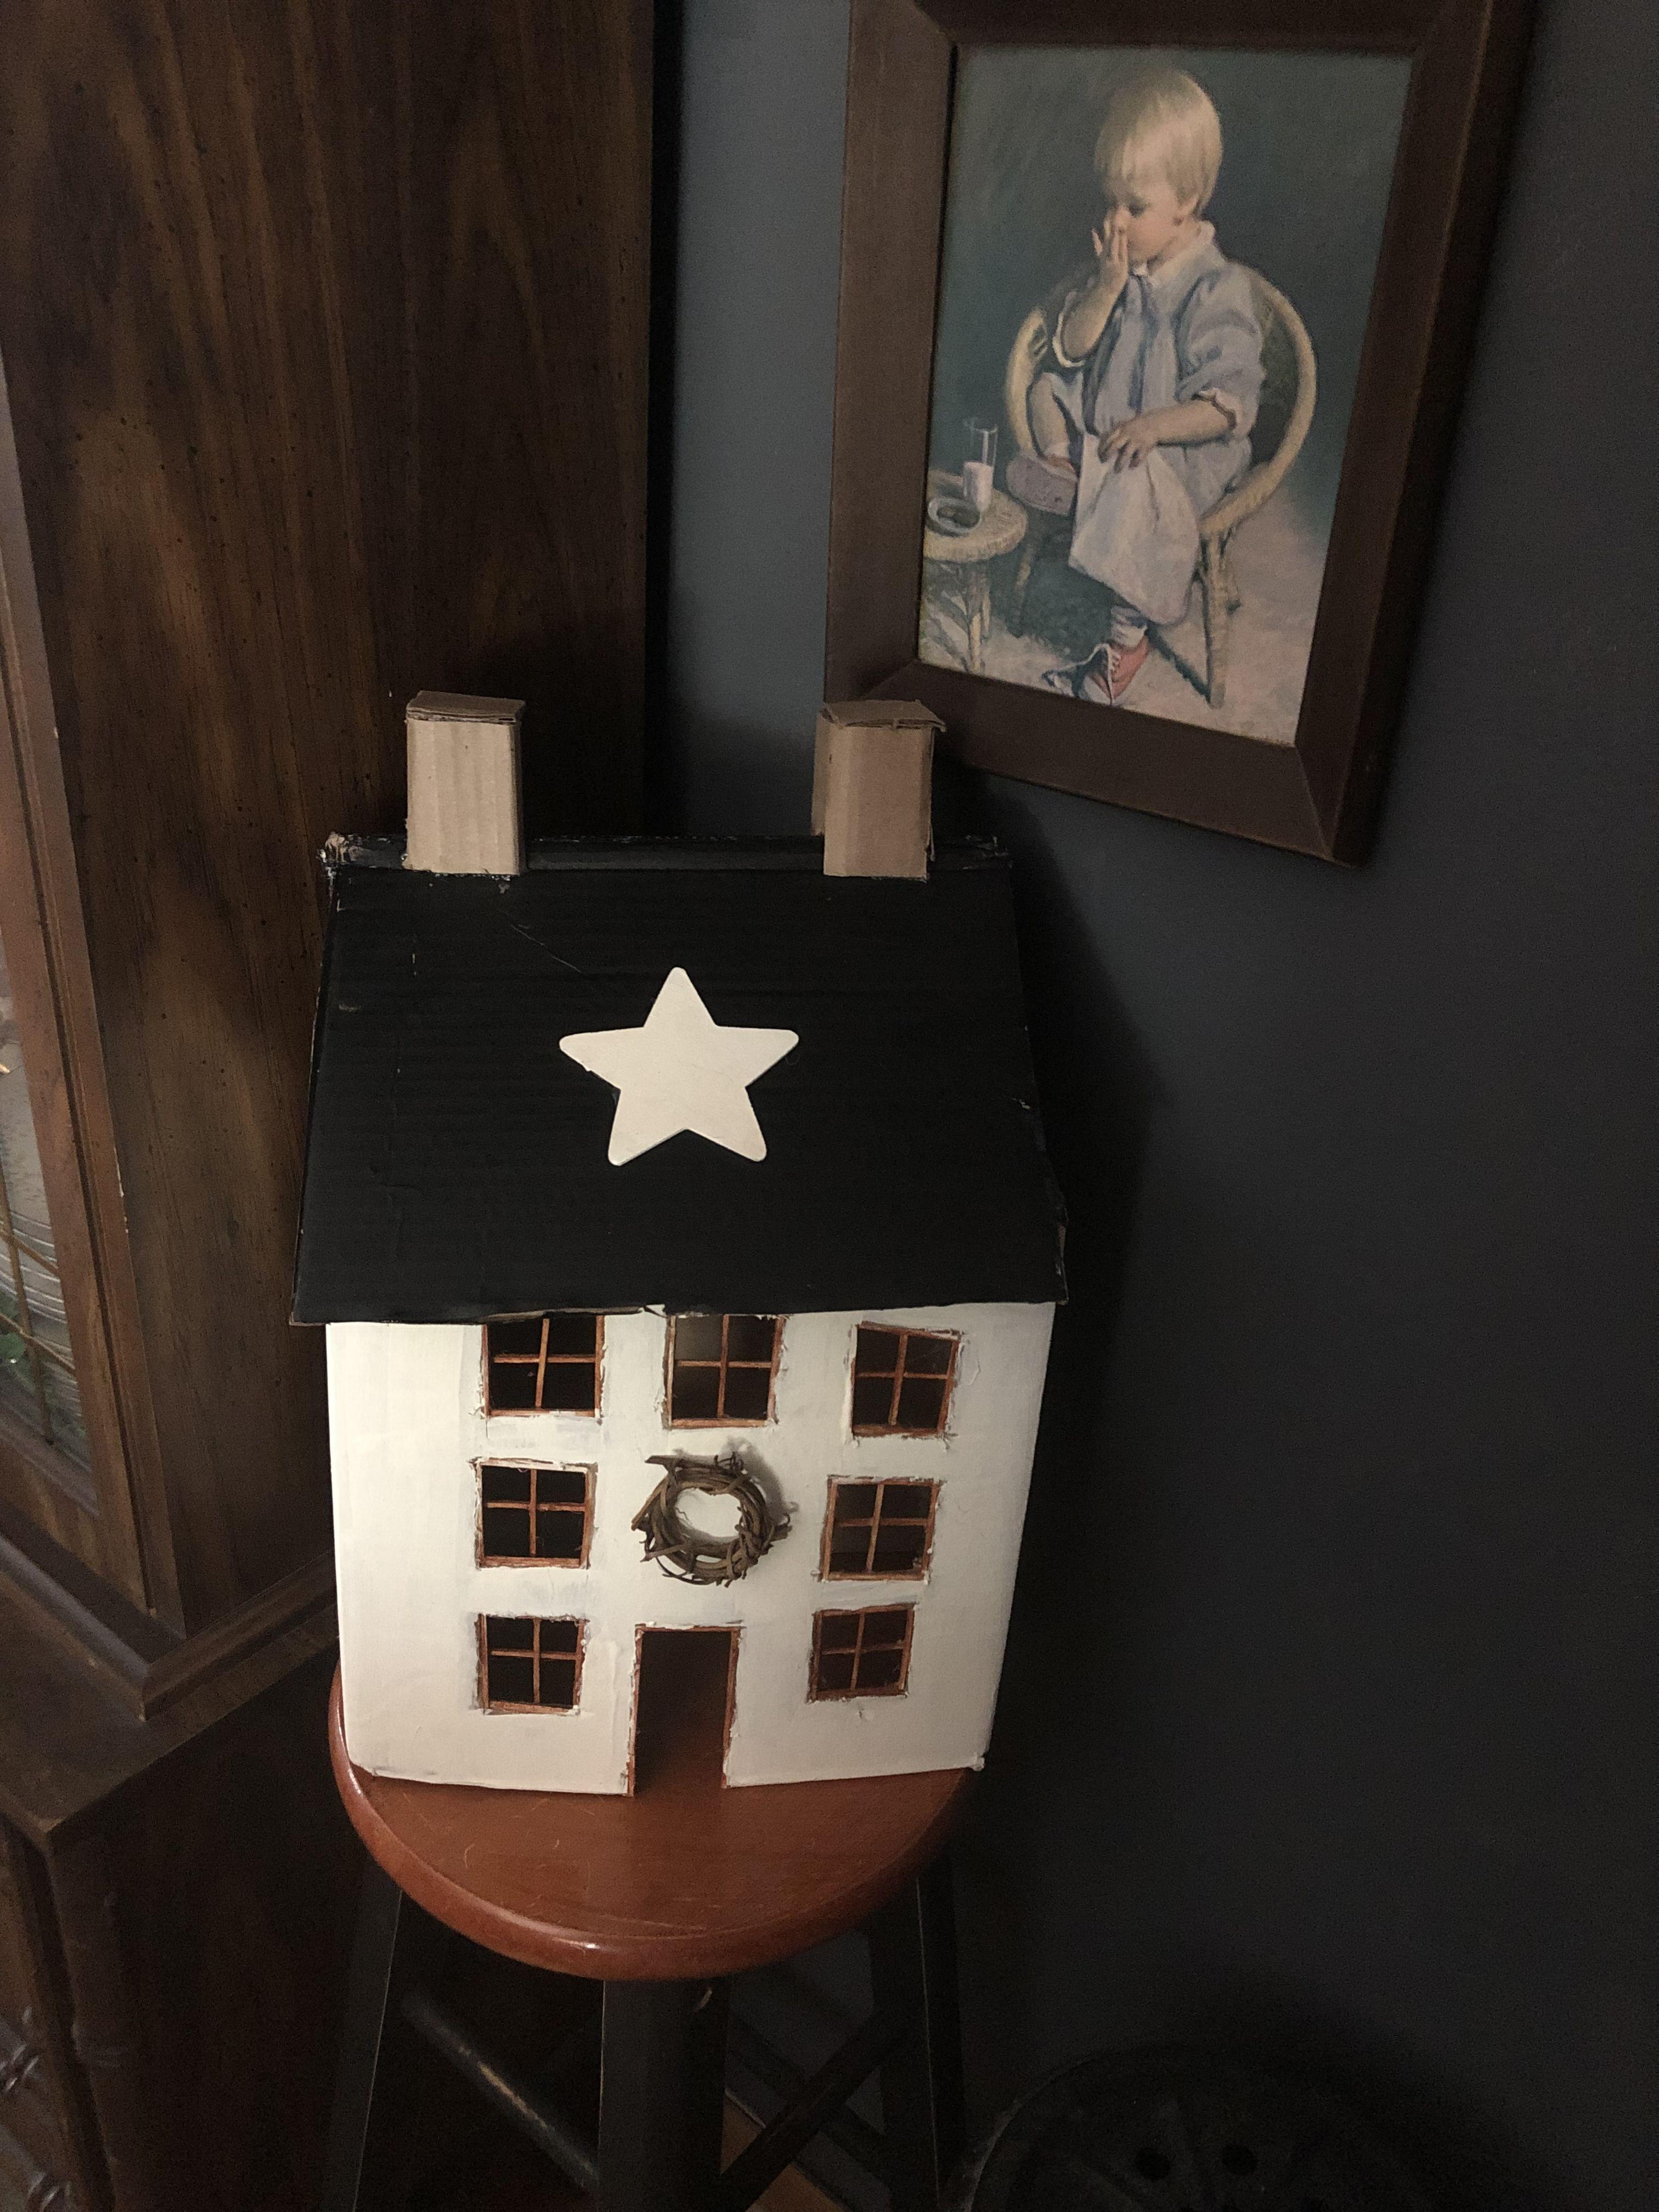 Saltbox House Saltbox Houses Box Houses Holiday Decor